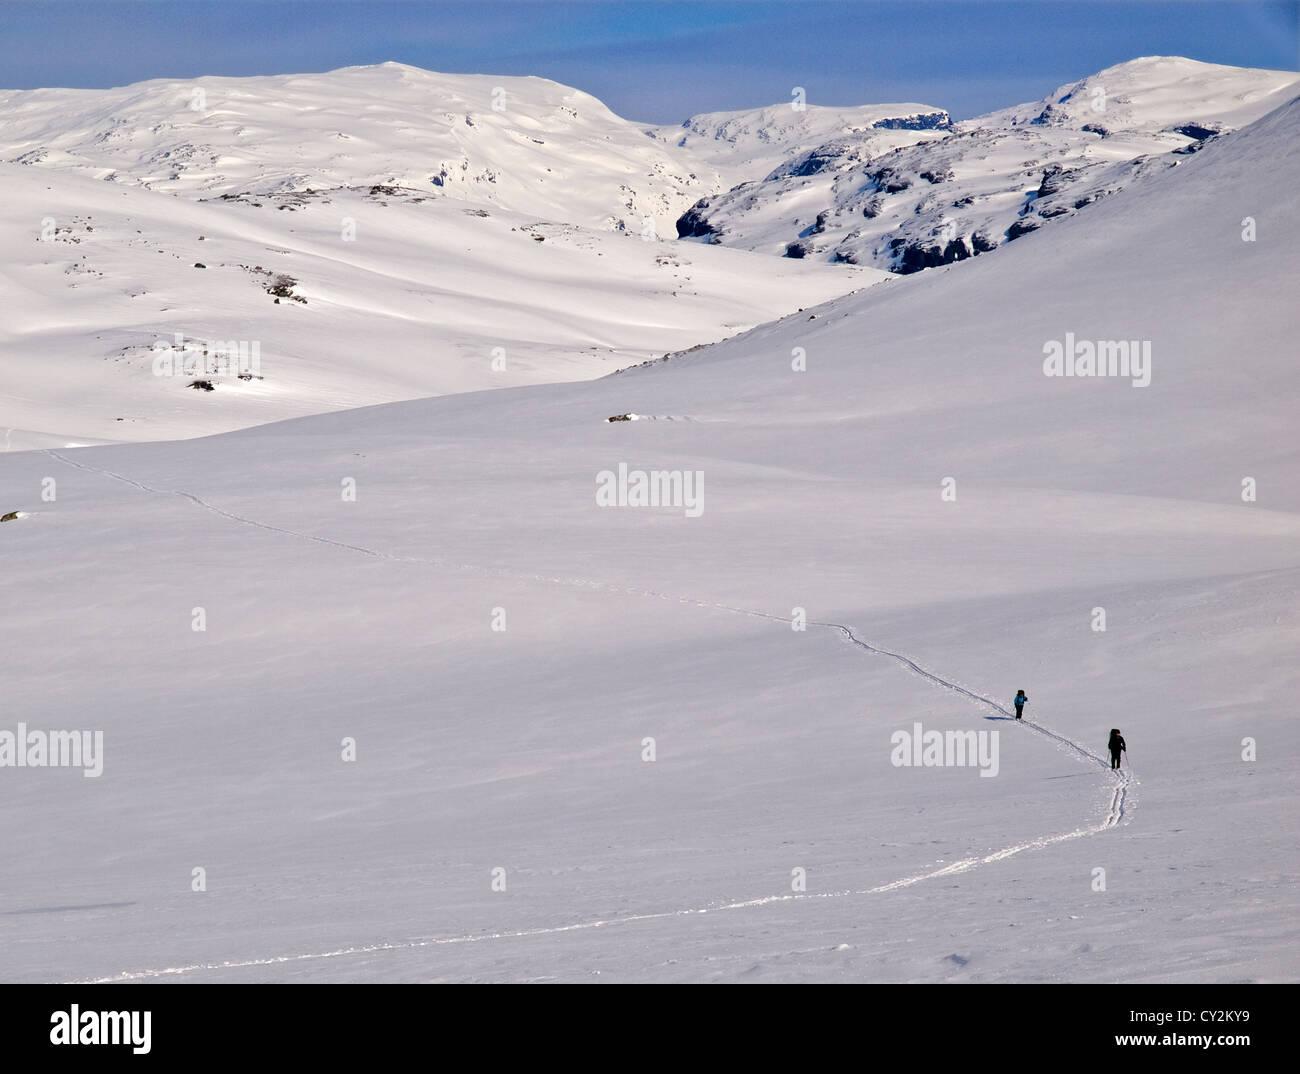 ski touring in the Hardanger region of Norway - Stock Image